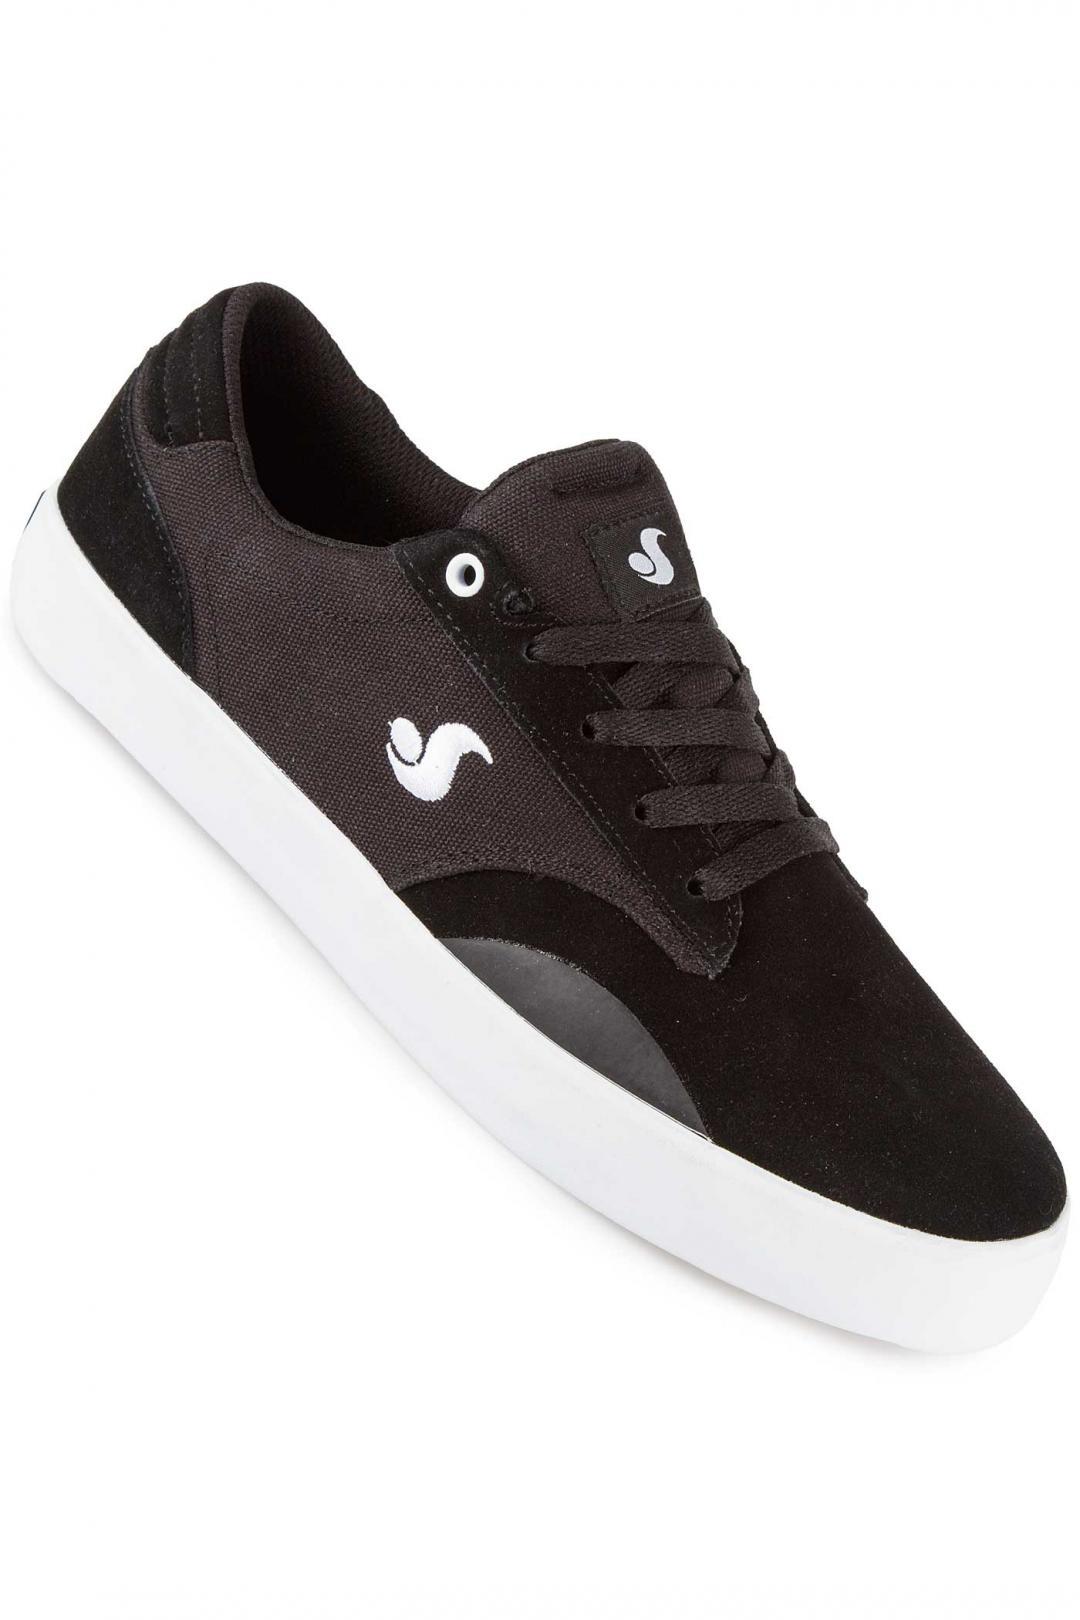 Uomo DVS Daewon 14 Suede Canvas black white   Sneakers low top